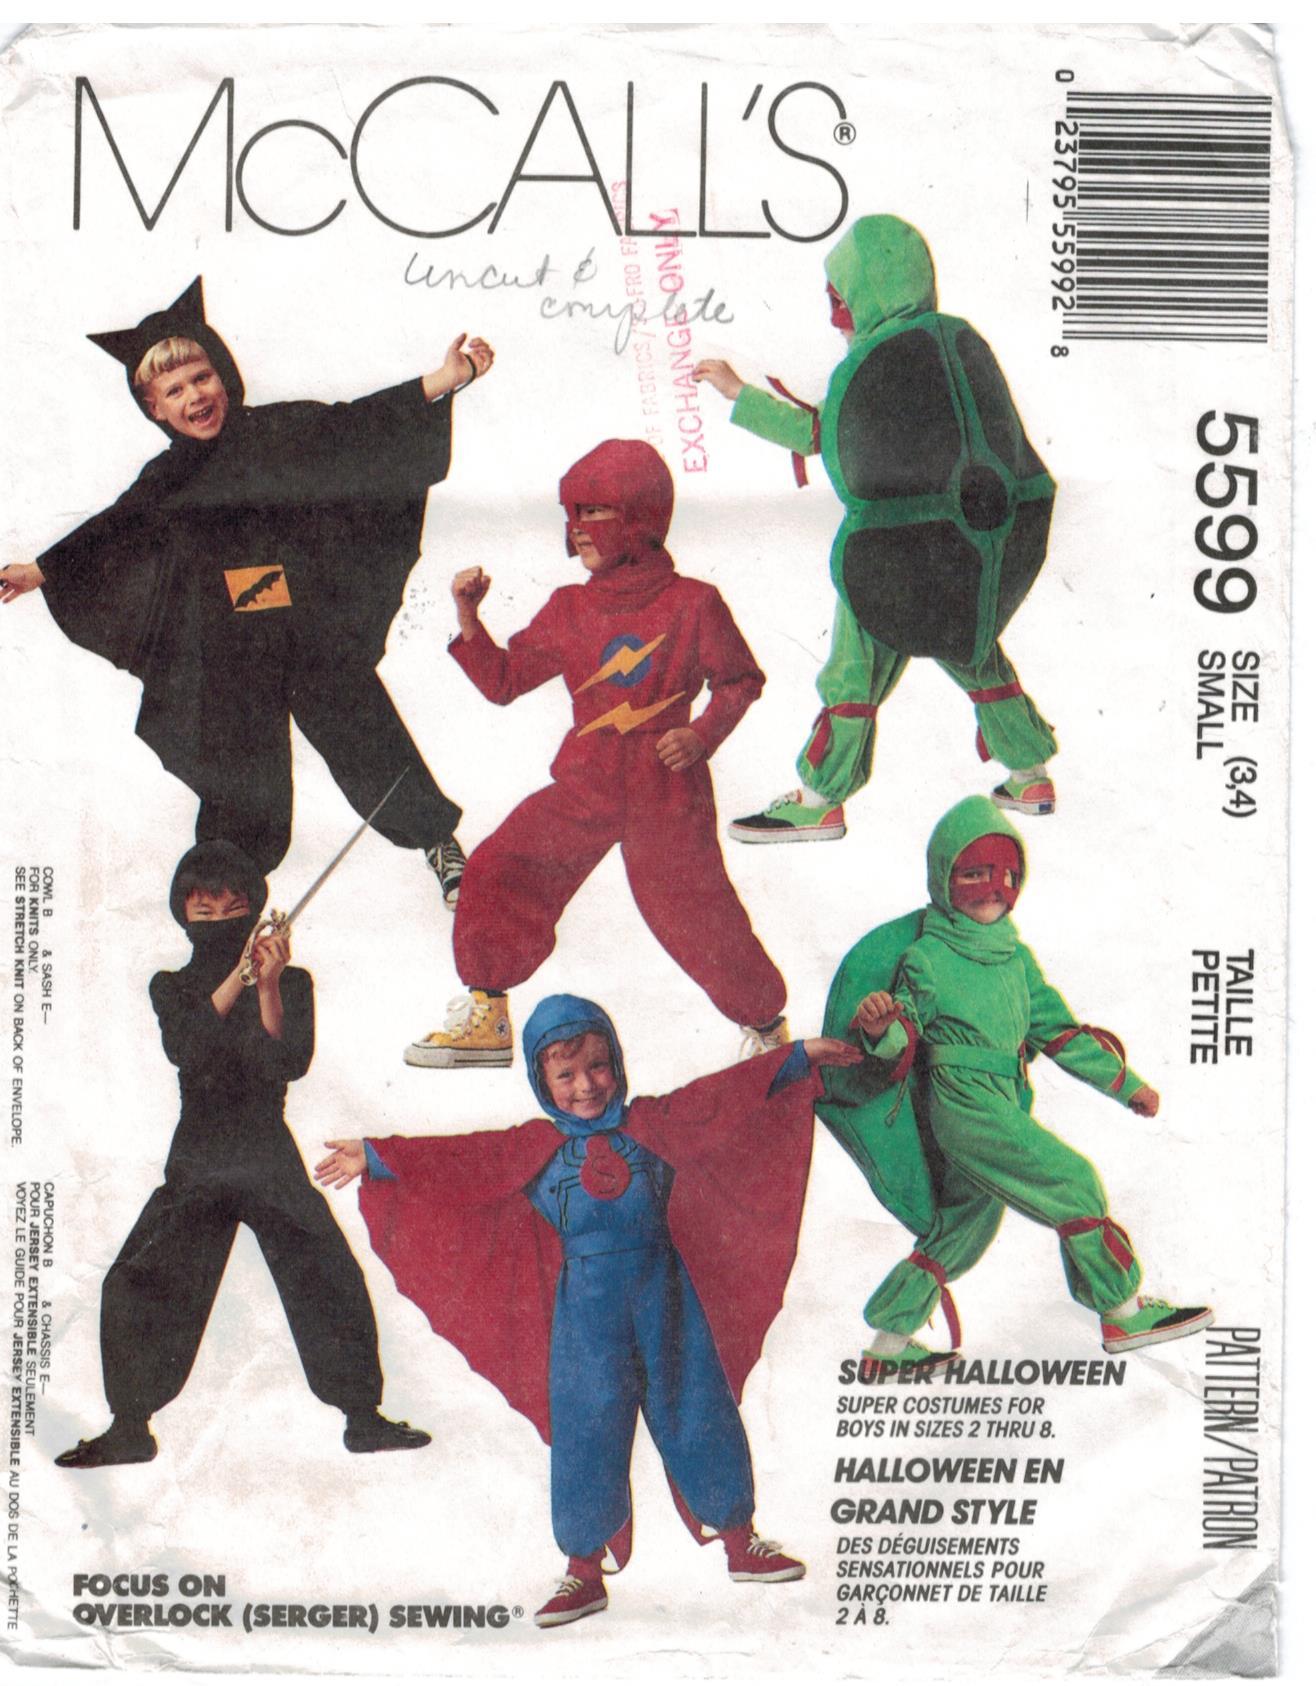 mccalls pattern